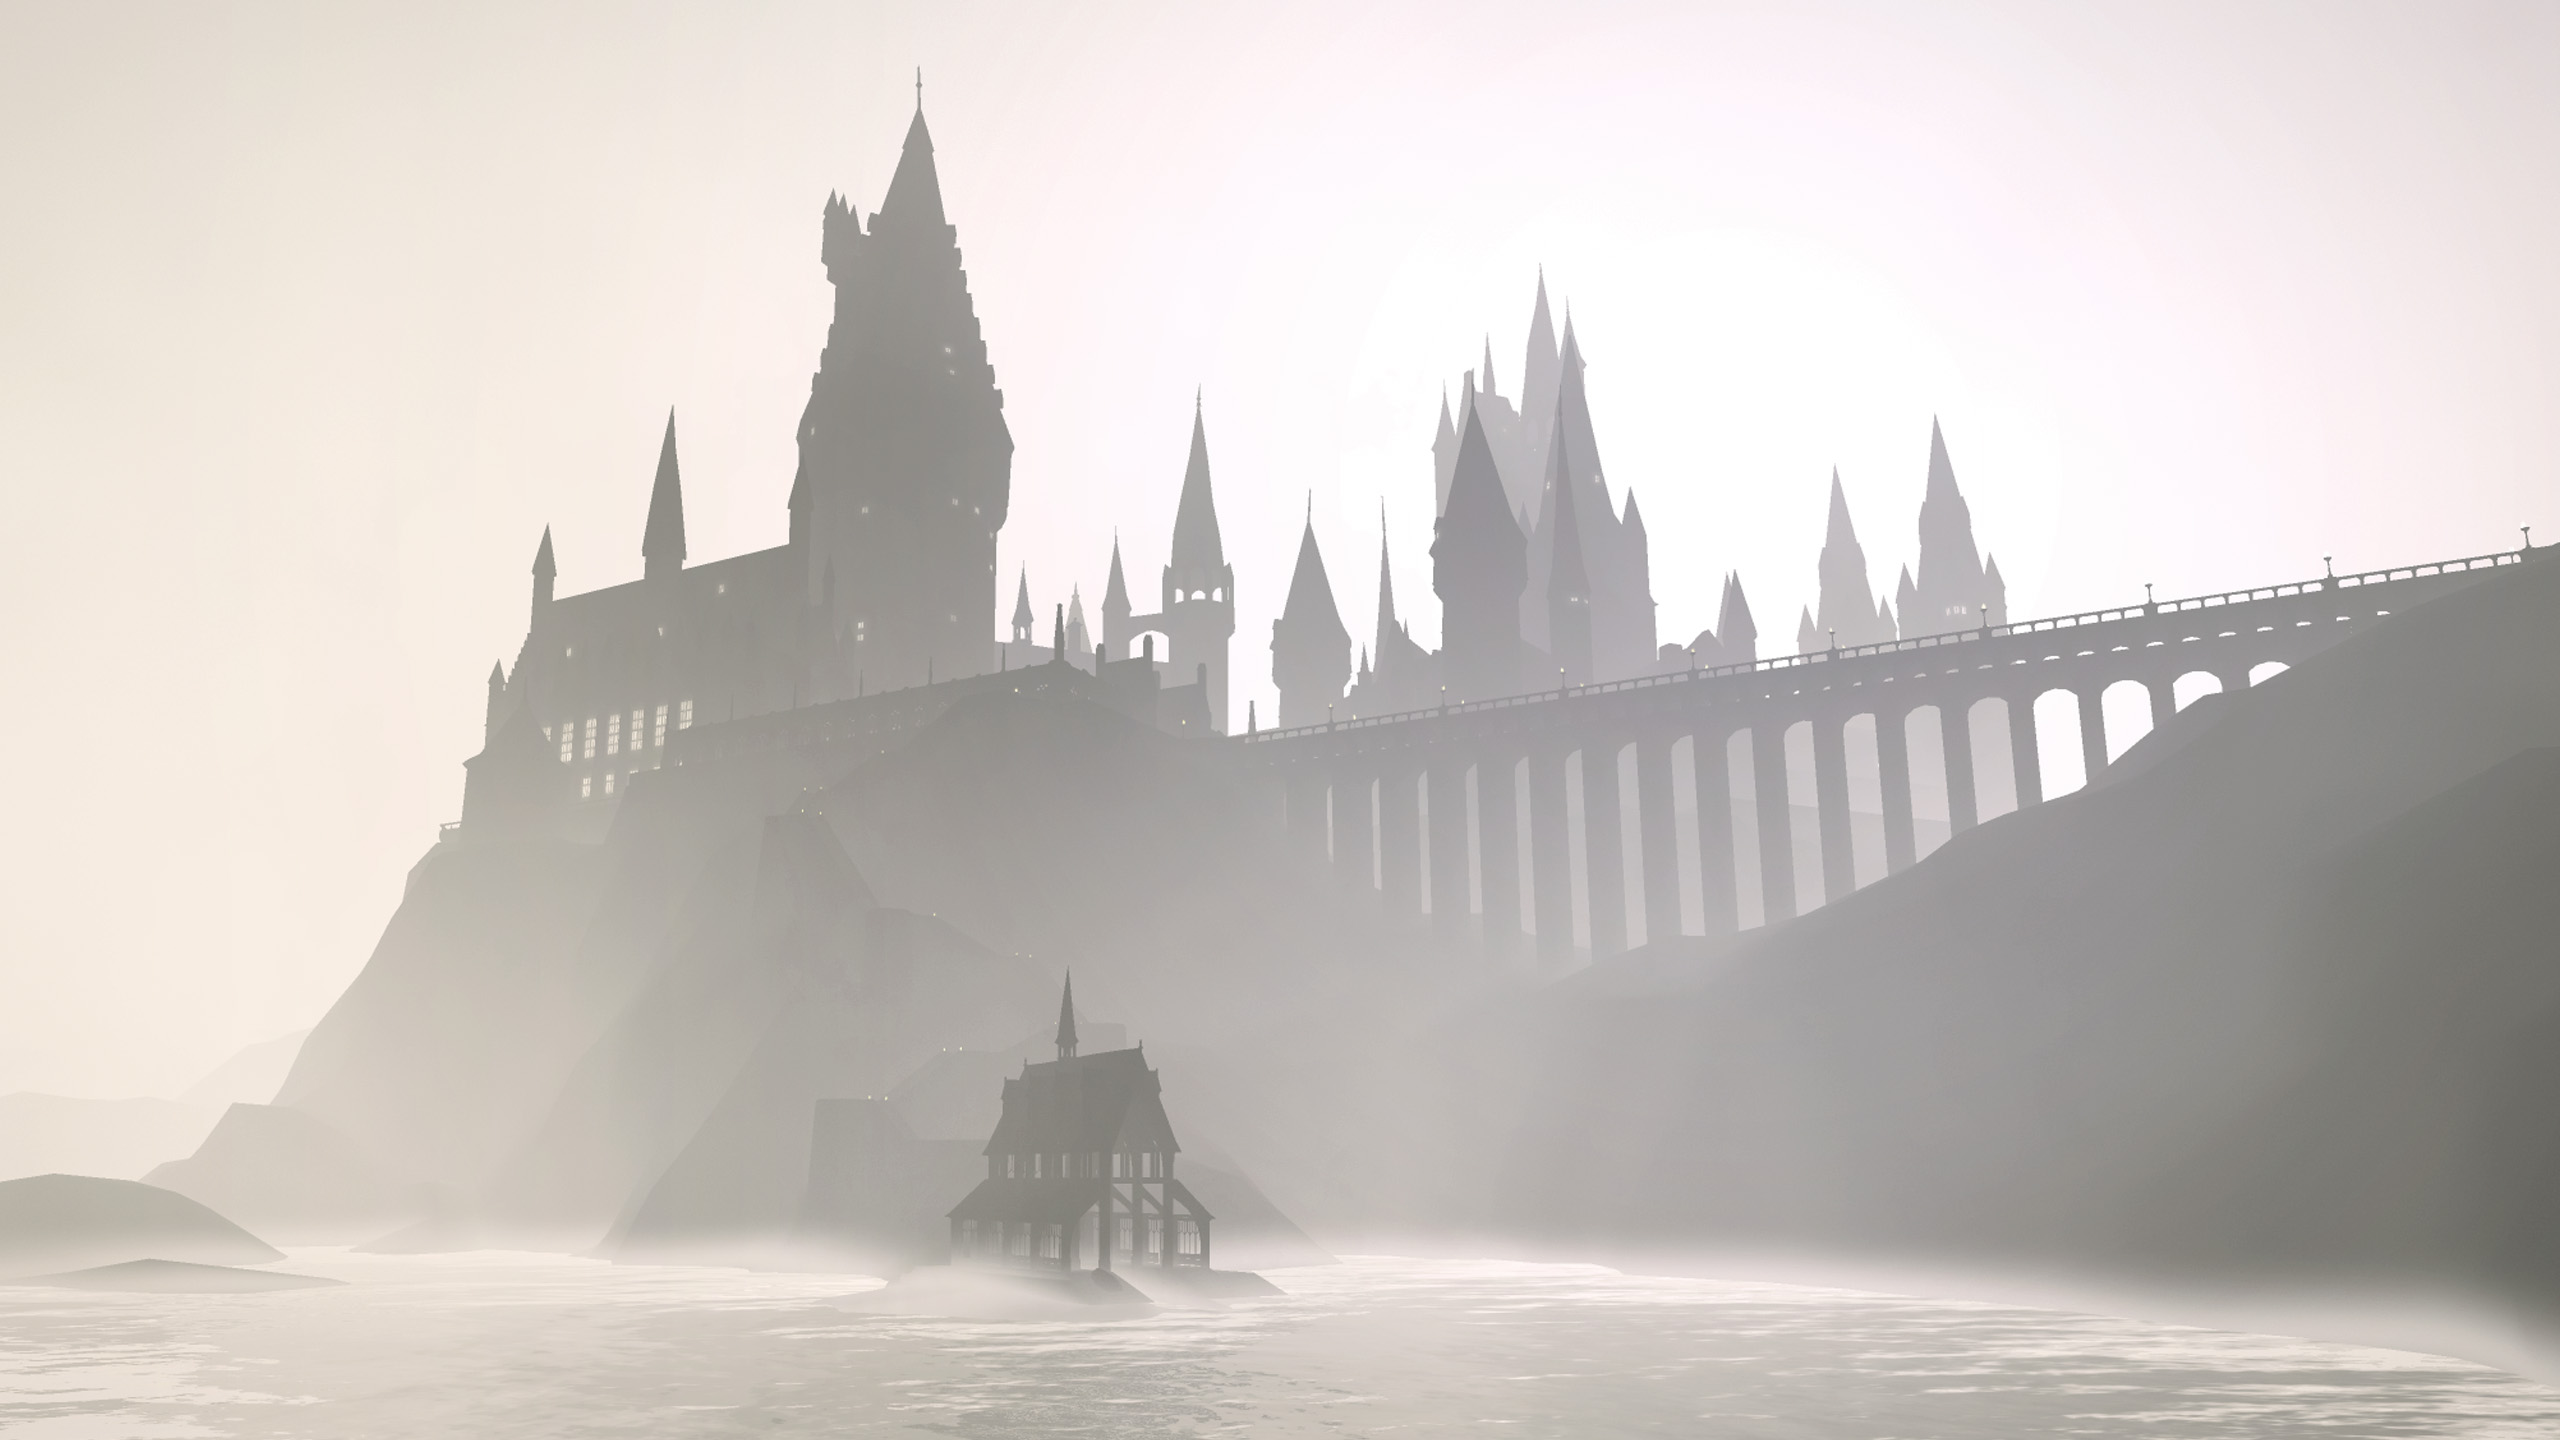 pottermore - 19 anni dopo back to hogwarts